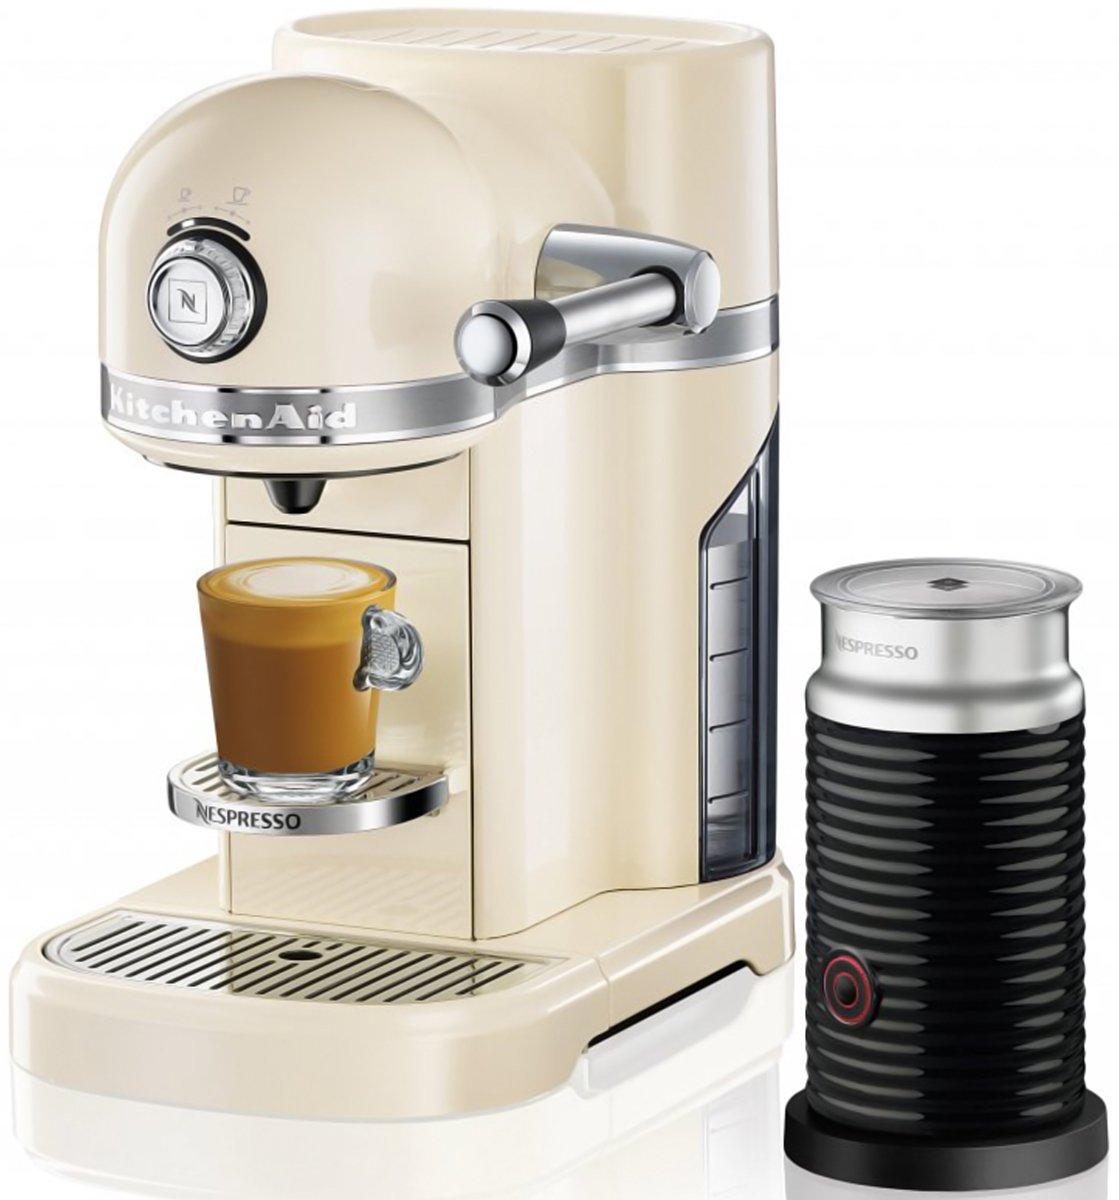 Kitchenaid Coffee Maker Kcm1202ob Manual : Kitchenaid Coffee Maker Wiring Diagram Perkins Diesel Ignition Switch Wiring Diagram